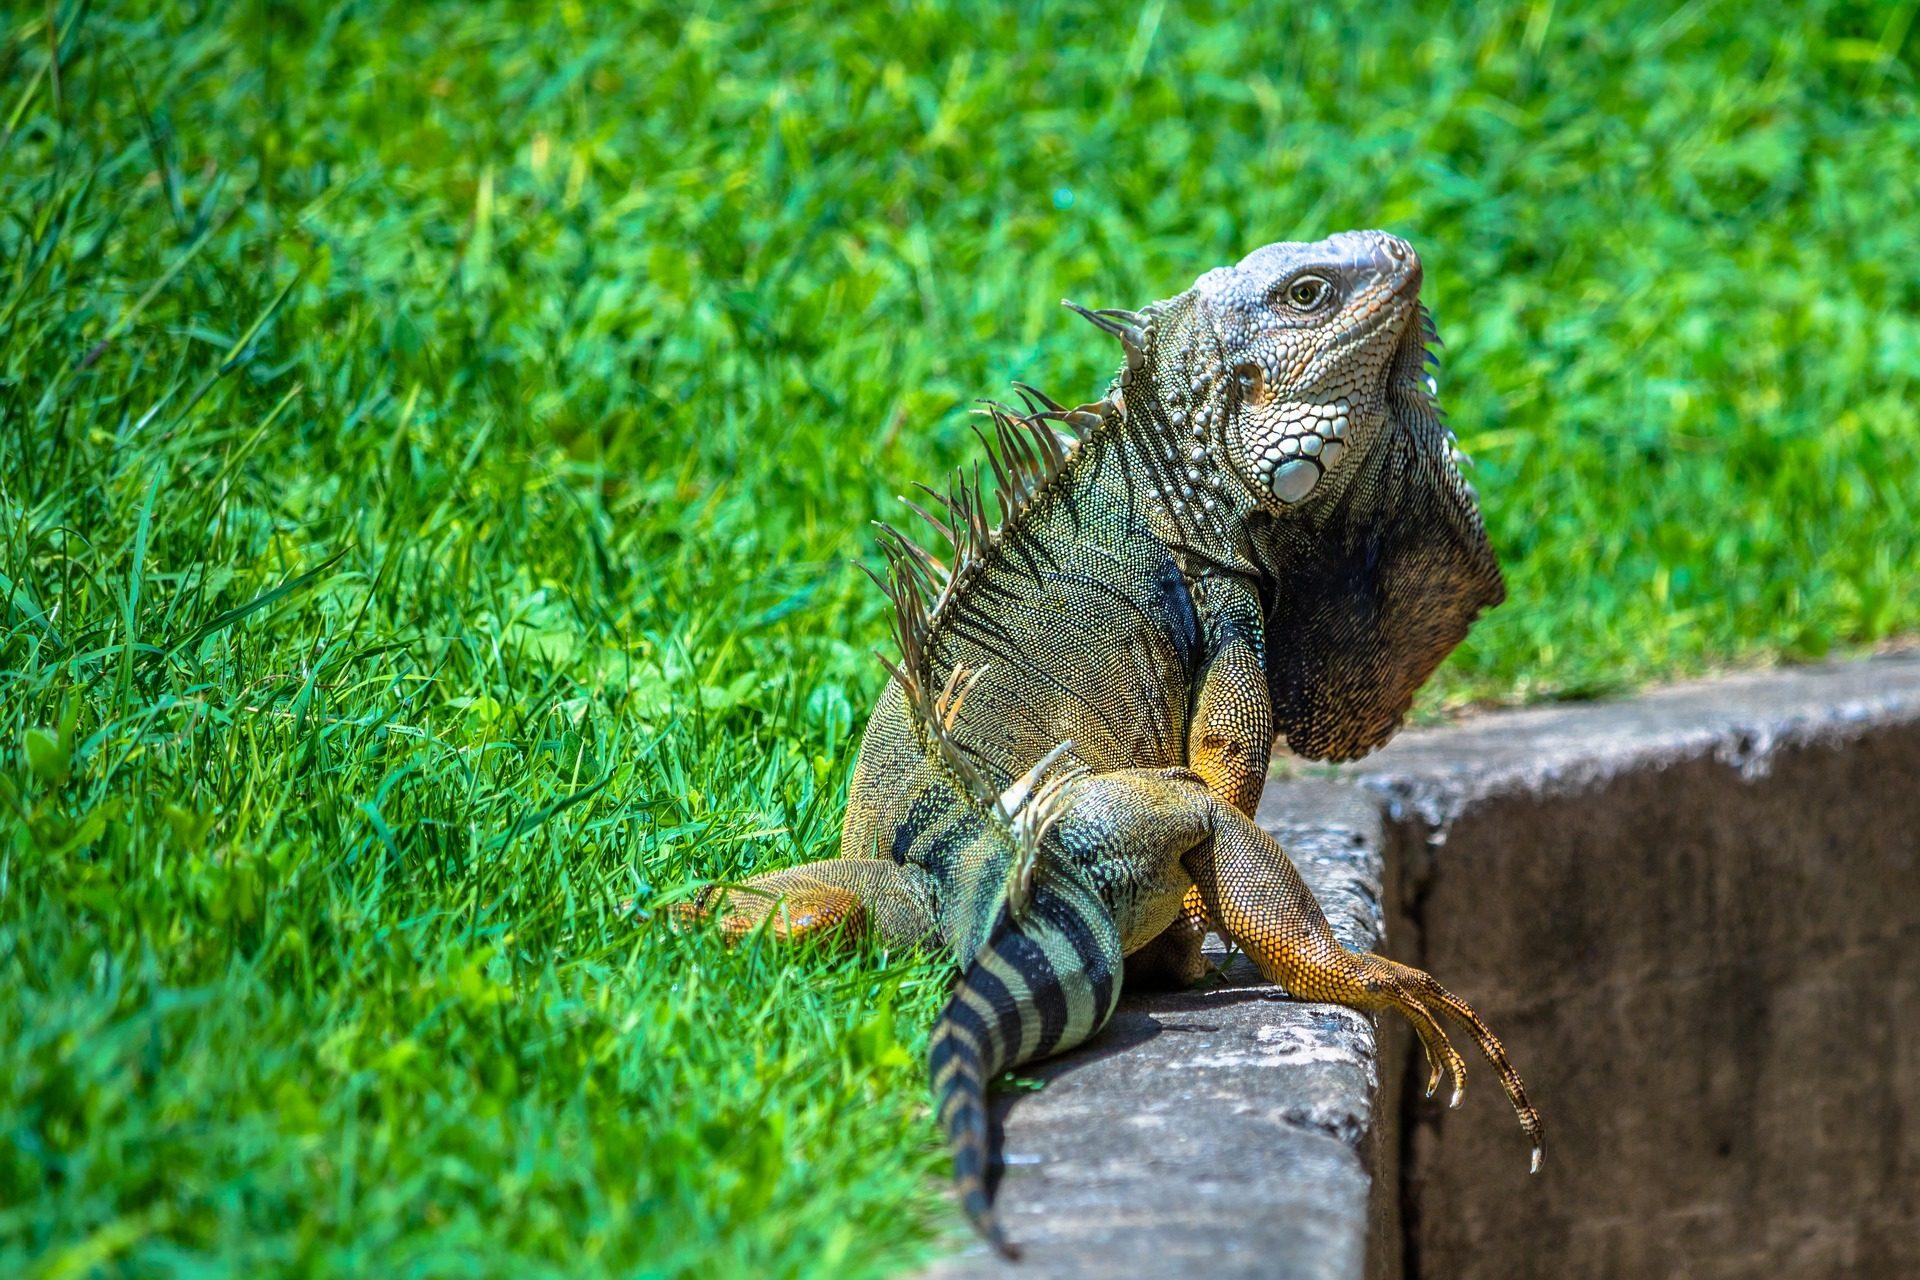 Fondo de pantalla de iguana reptil garras jard n for Hierba jardin